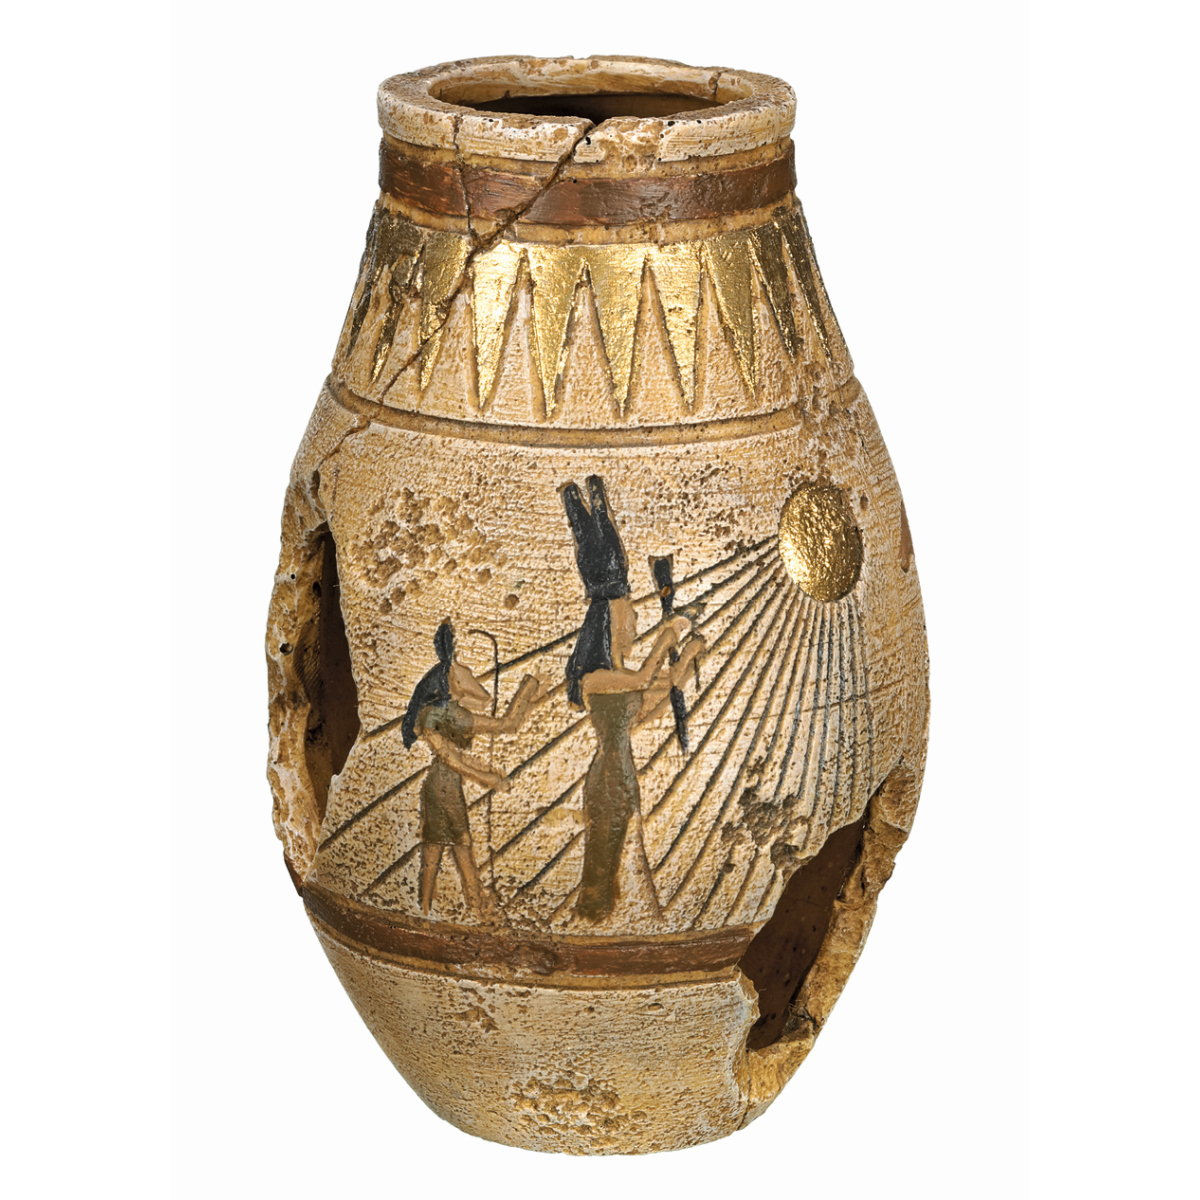 NB EGYPTIAN JAR 80X80X125MM 00001